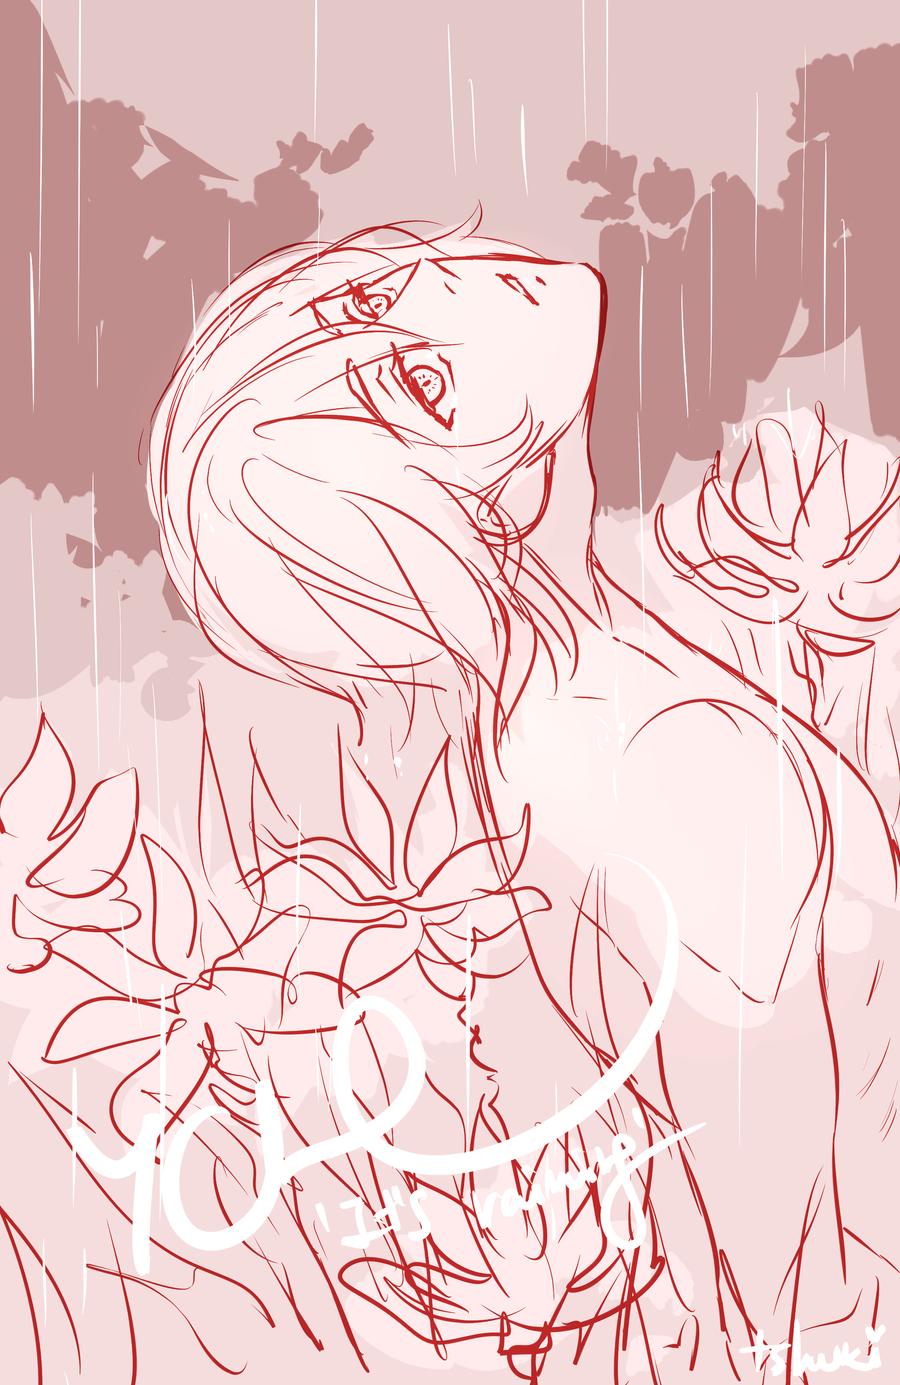 [YCH Auction] It's raining [closed] by tshuki on DeviantArt